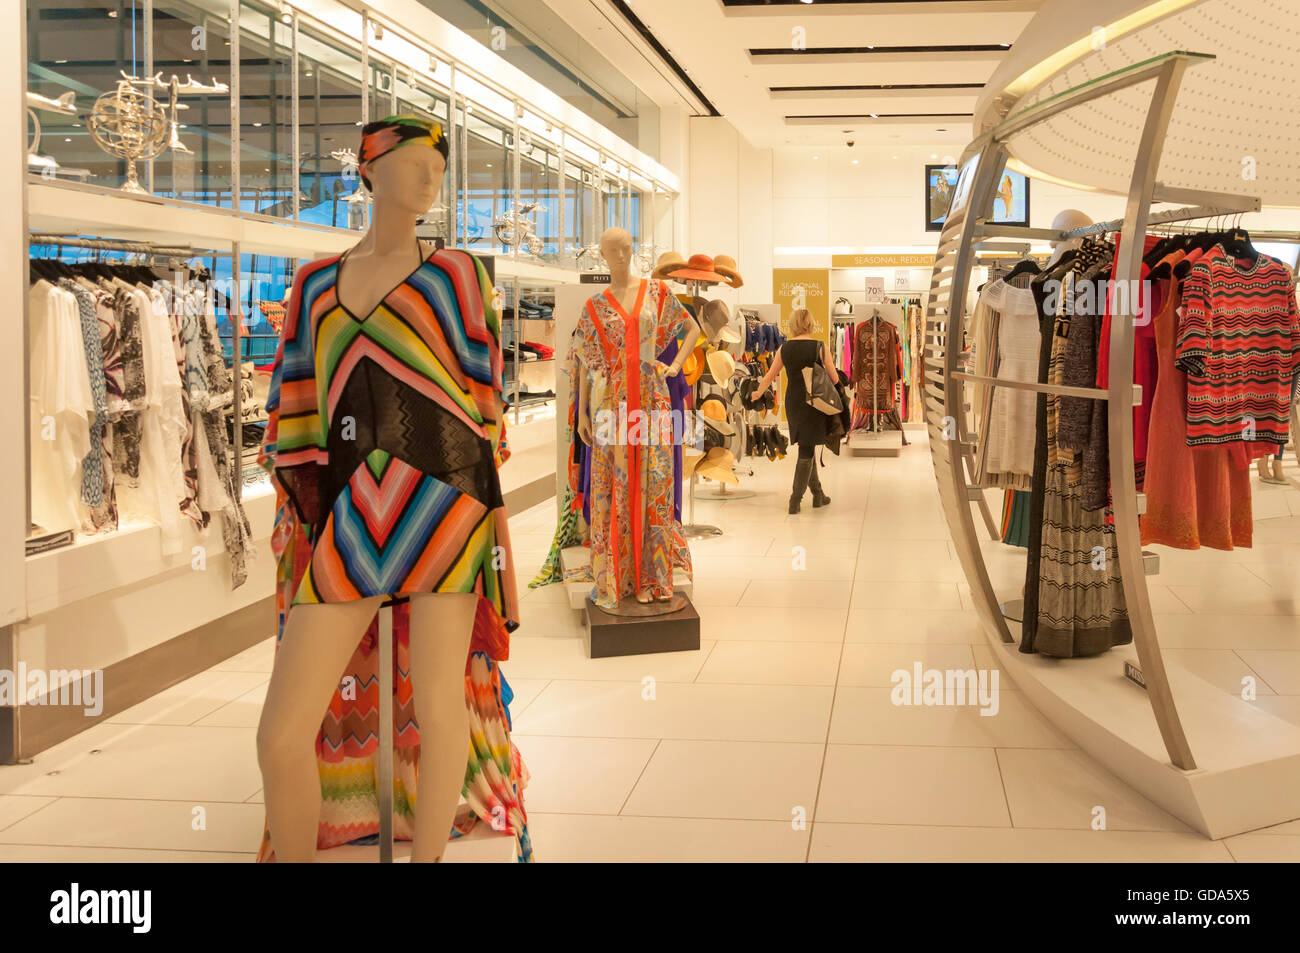 Harrods Store, Terminal 5, Heathrow Airport. London Borough of Hounslow, Greater London, England, United Kingdom - Stock Image